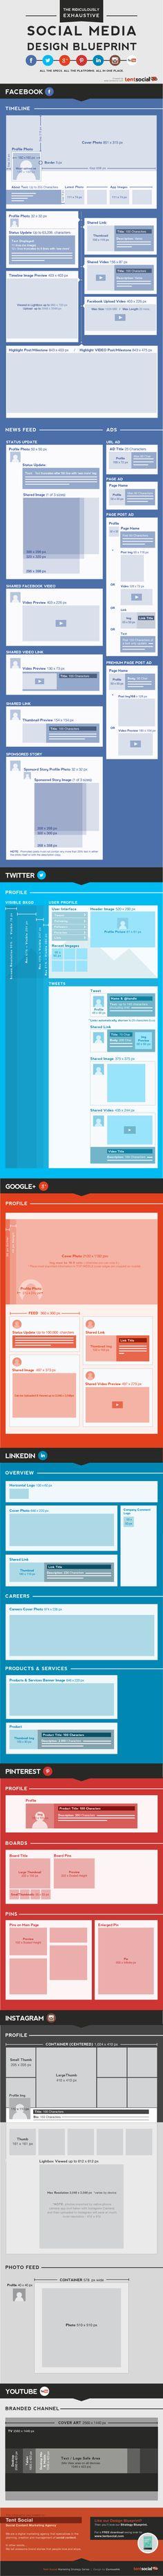 Image Dimensions for Various Social Media Platforms - #webdesign #images #picture #header #profile #twitter #facebook #google #pinterest #linkedin #instagram #socialmedia #youtube